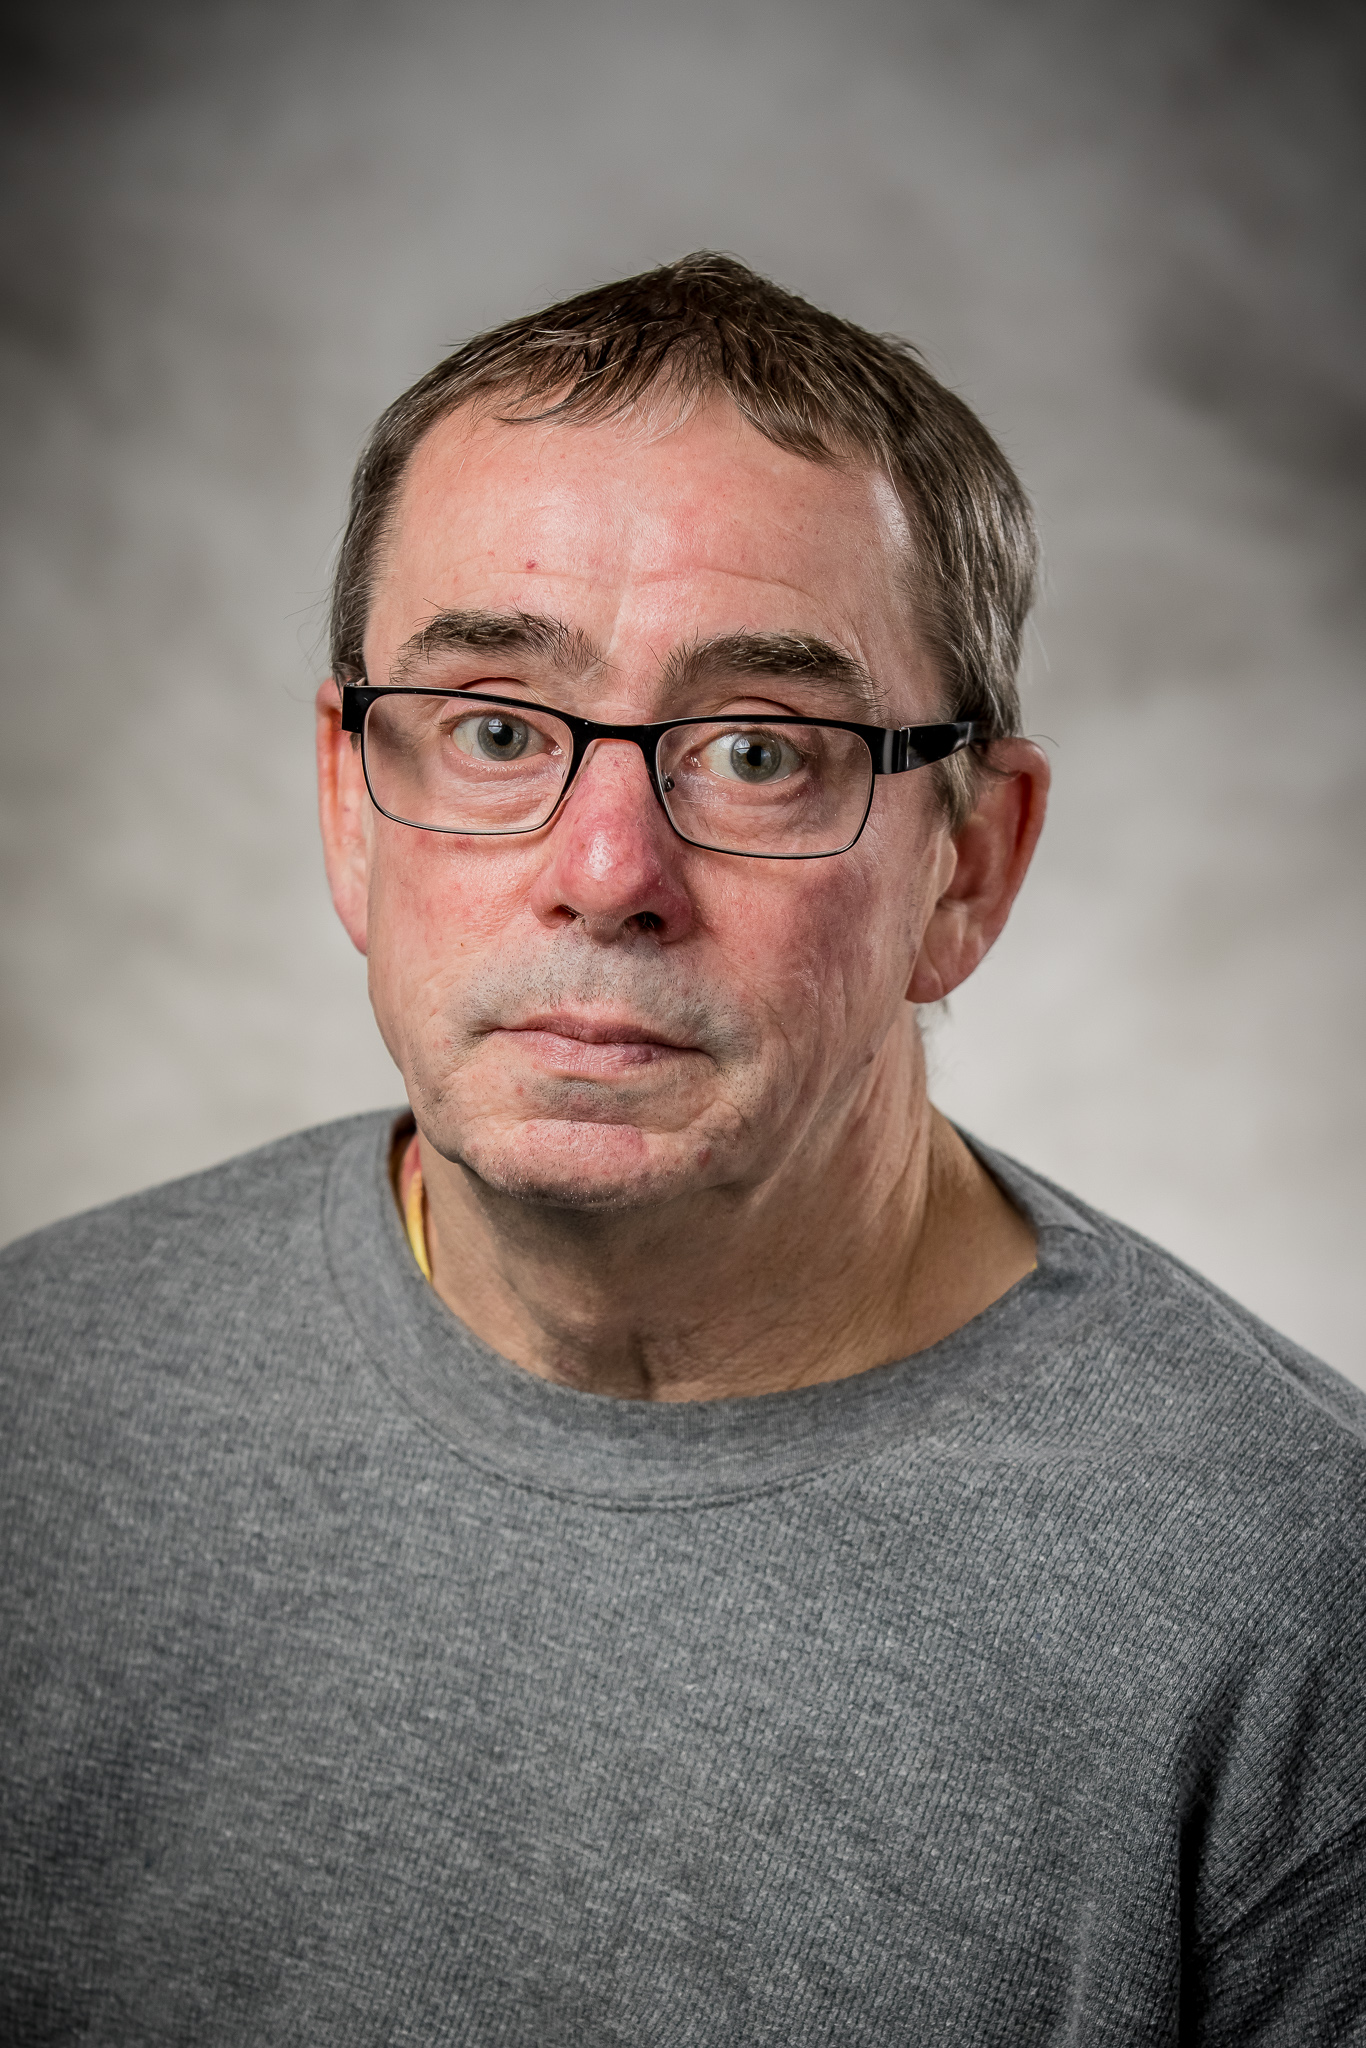 Man wearing glasses and grey crewneck